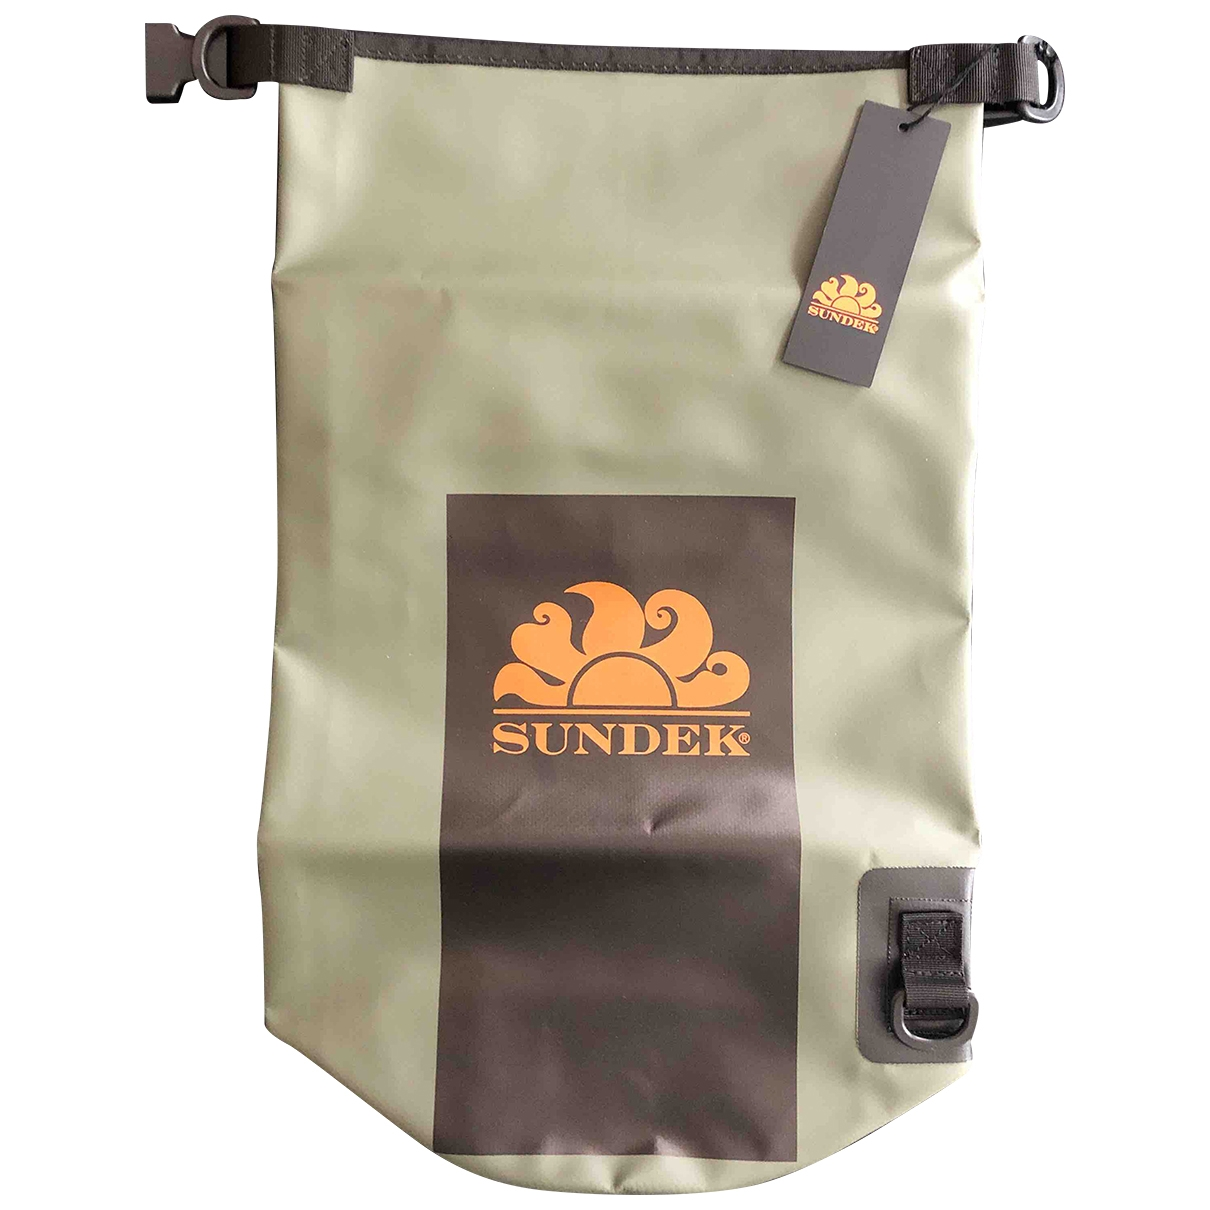 Sundek - Natation   pour lifestyle en cuir - kaki